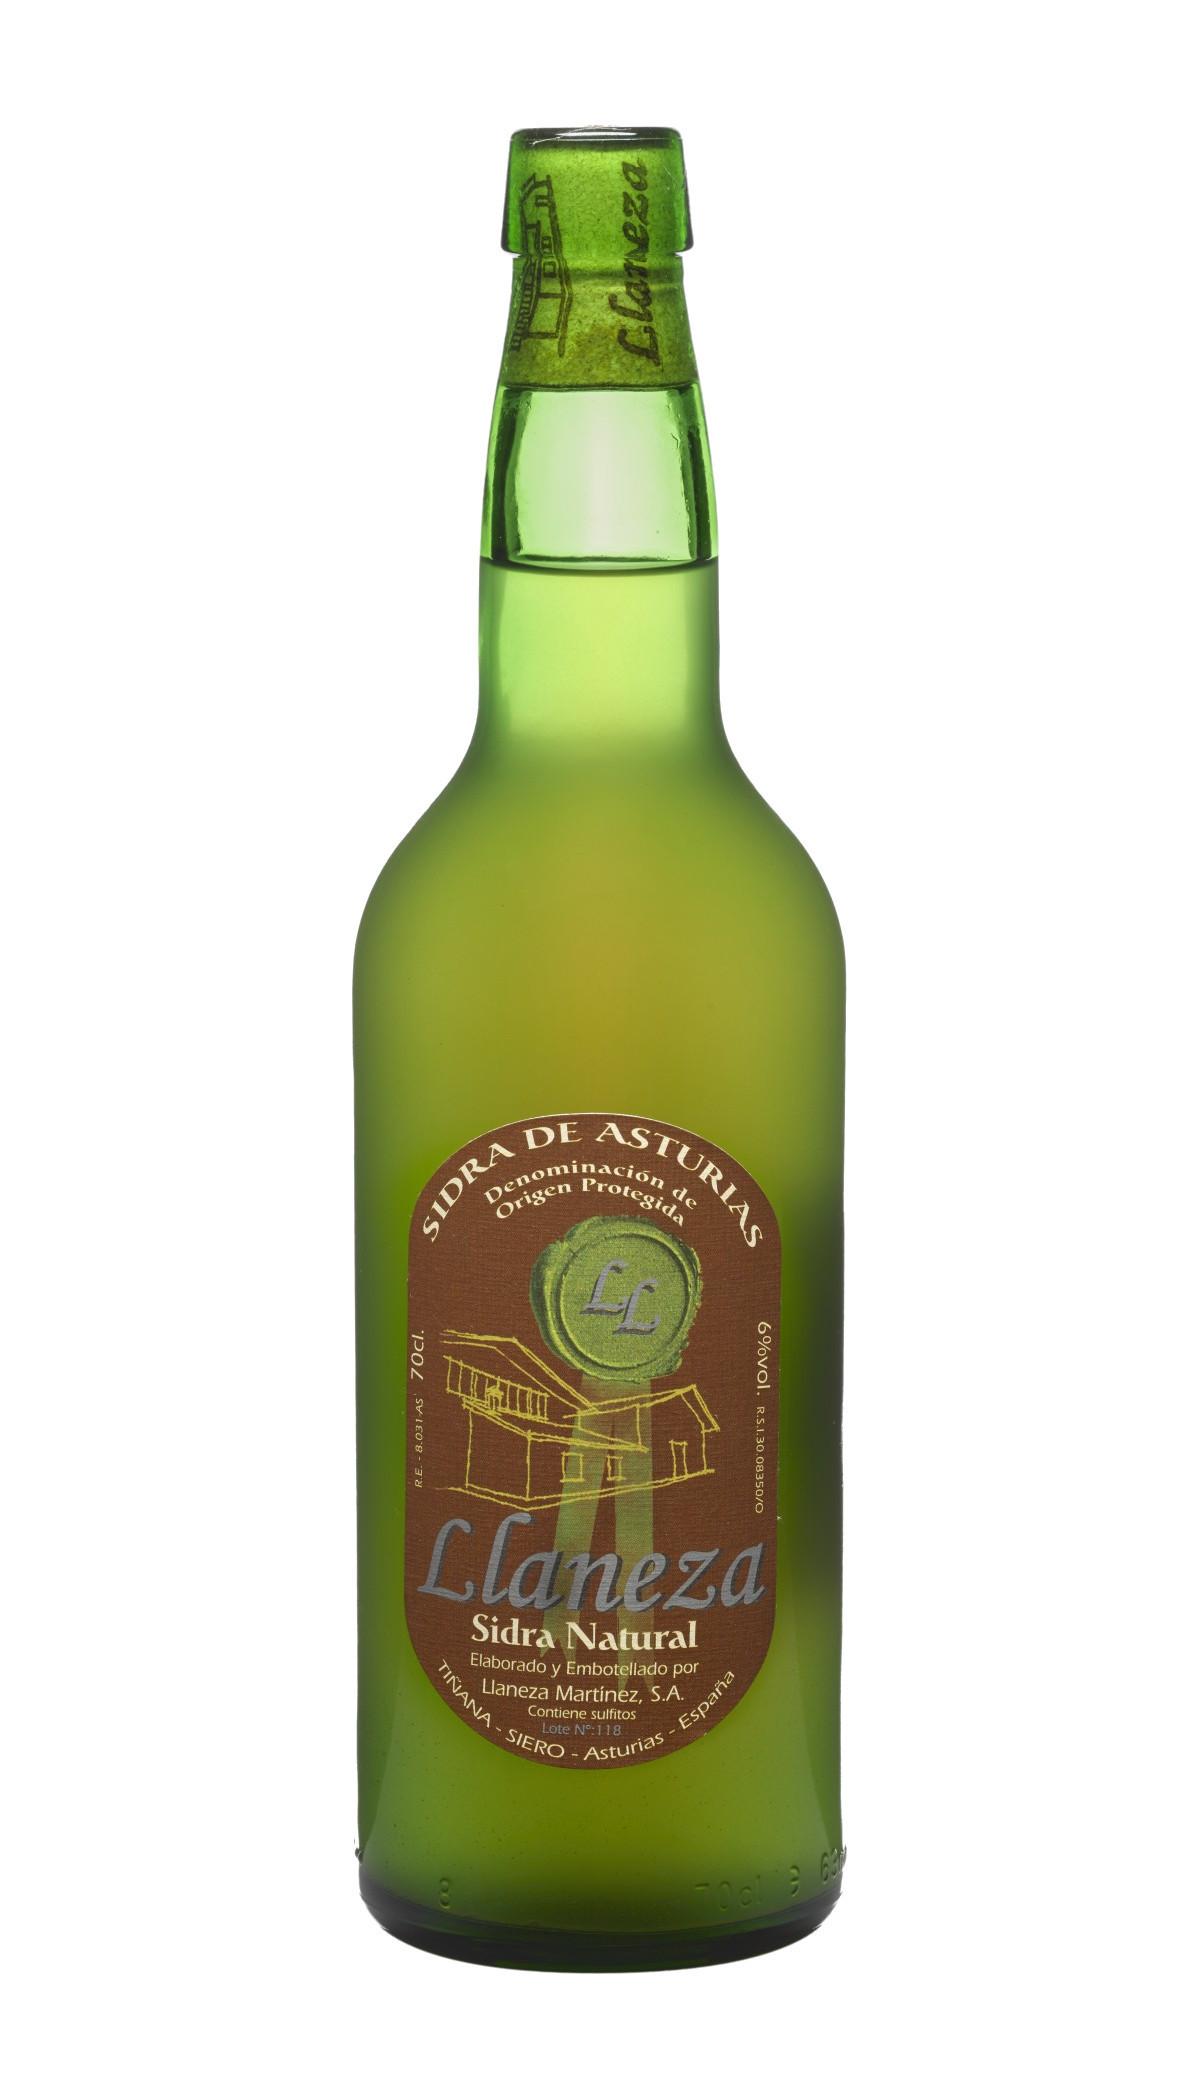 Botella de Sidra Natural Llaneza